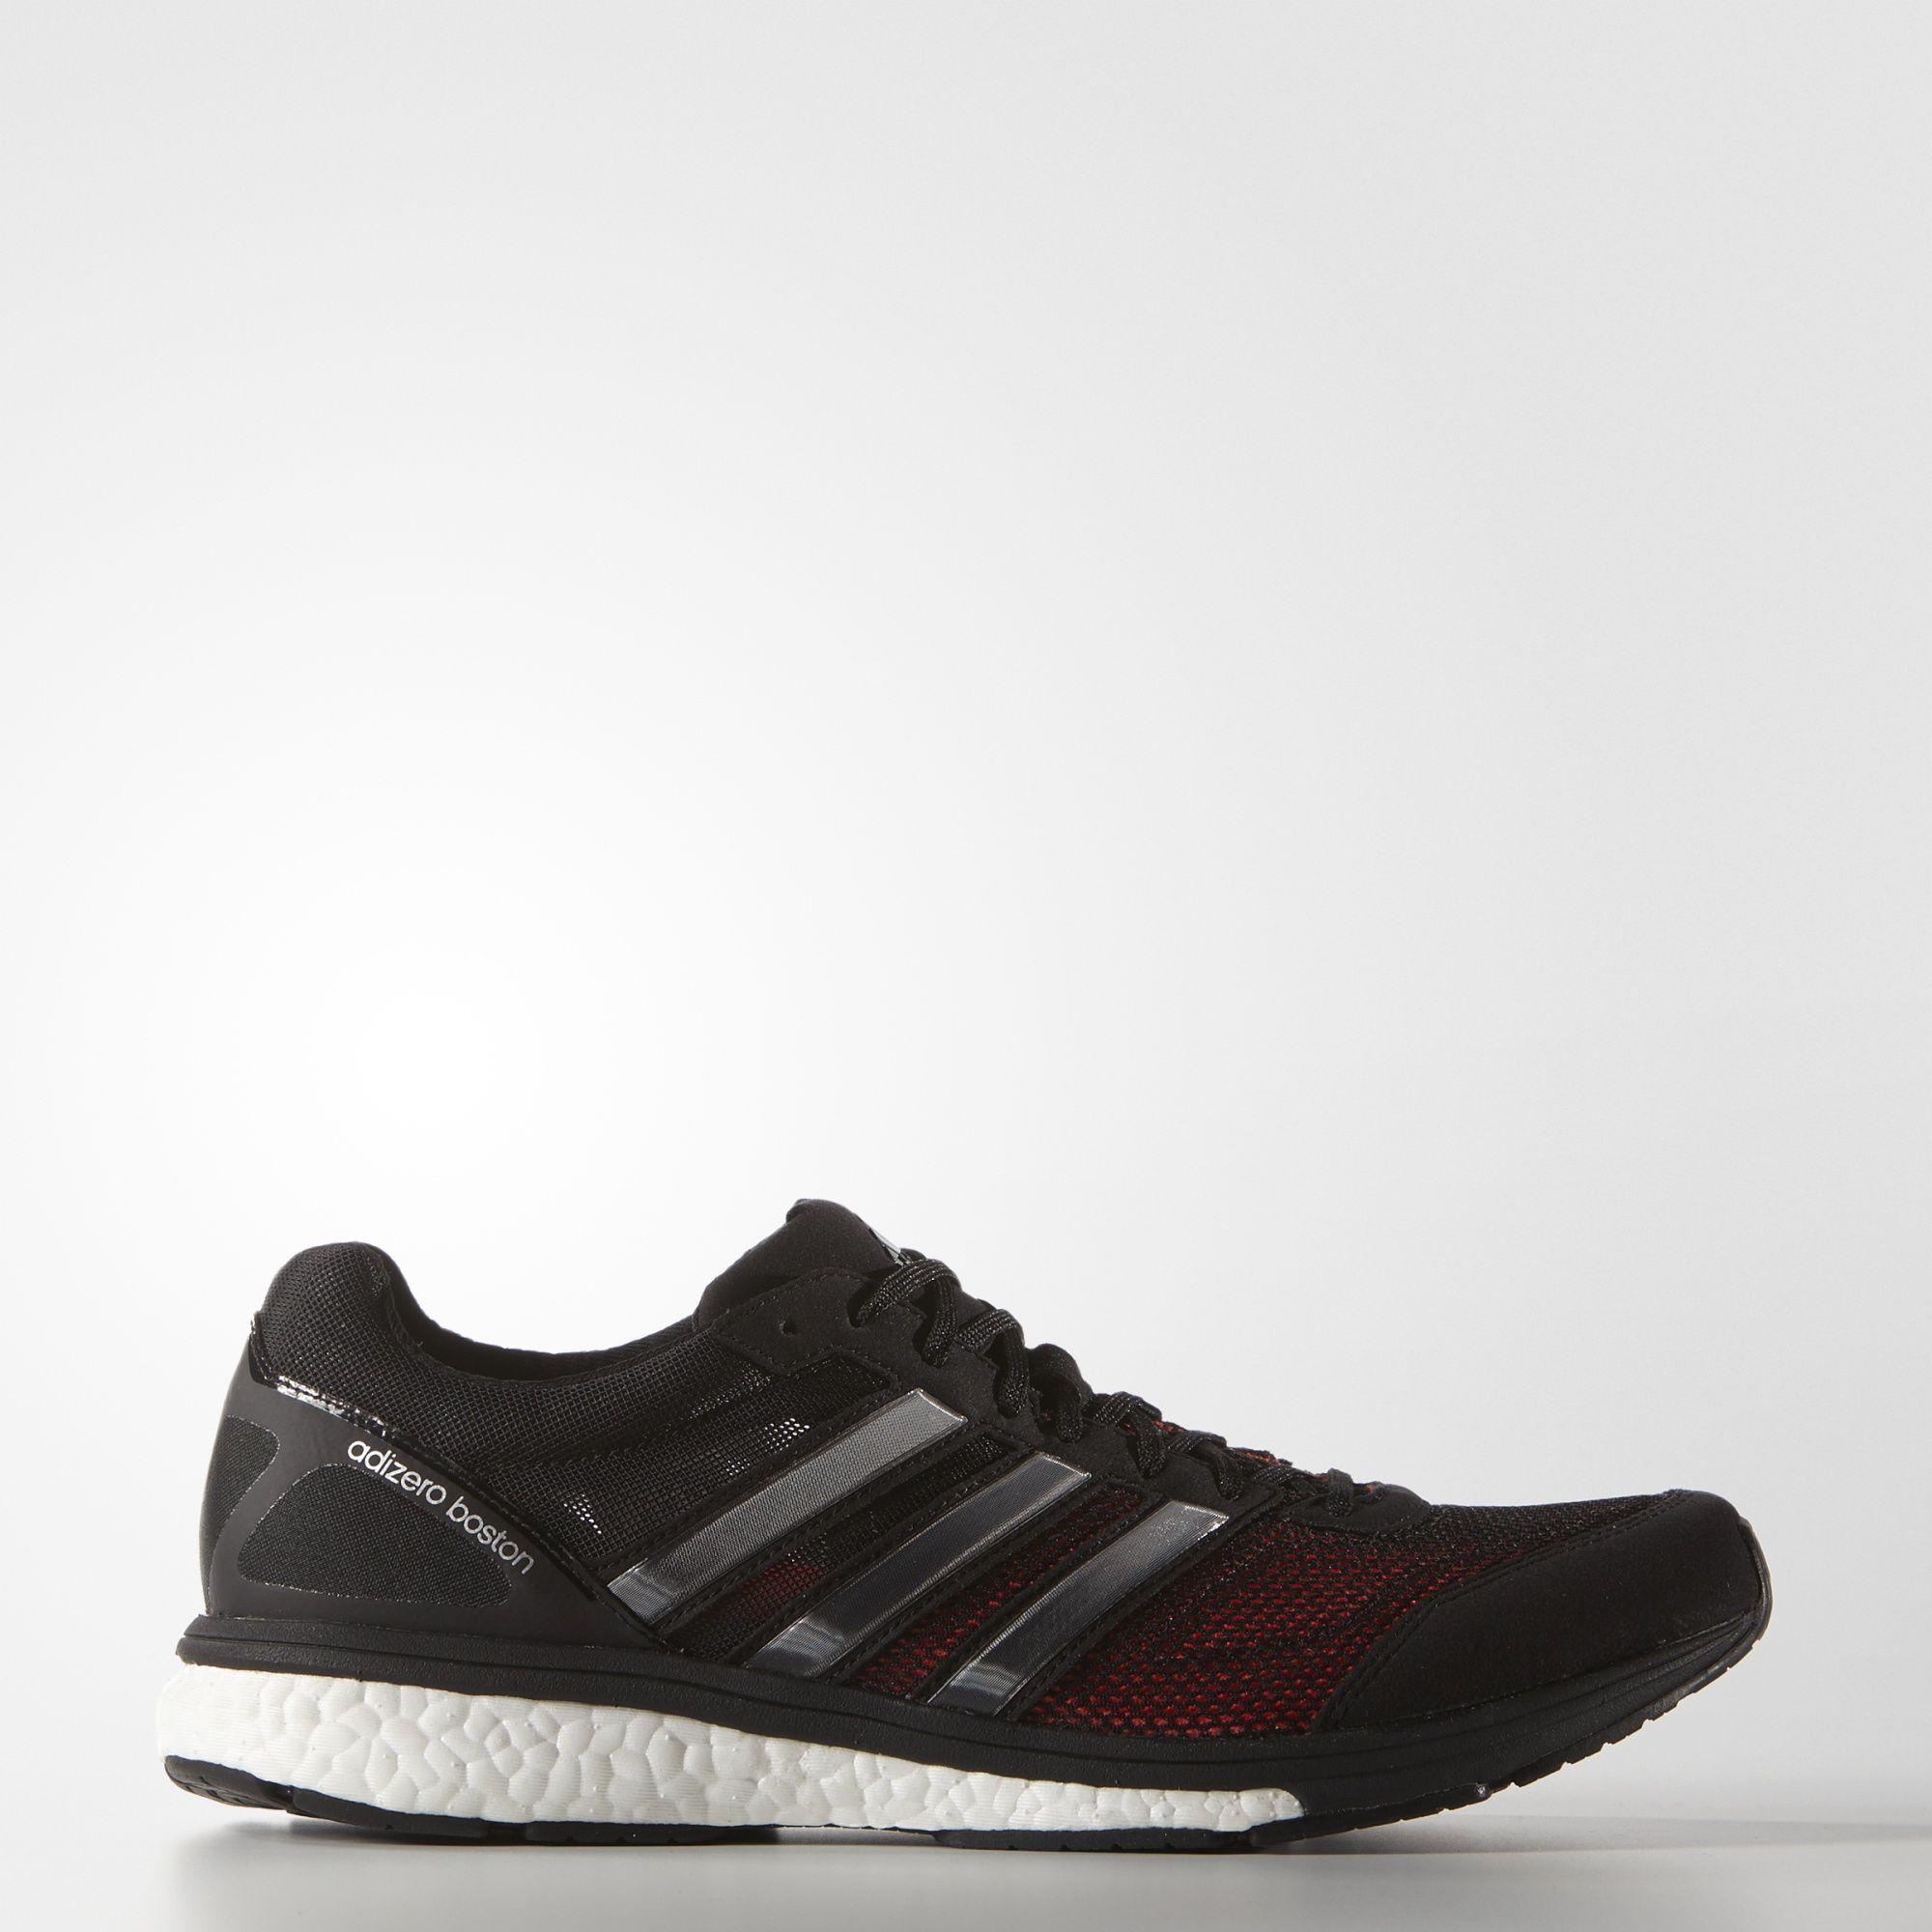 Adidas Superstar Schuhe adidas adizero Boston Boost 5 Schuhe